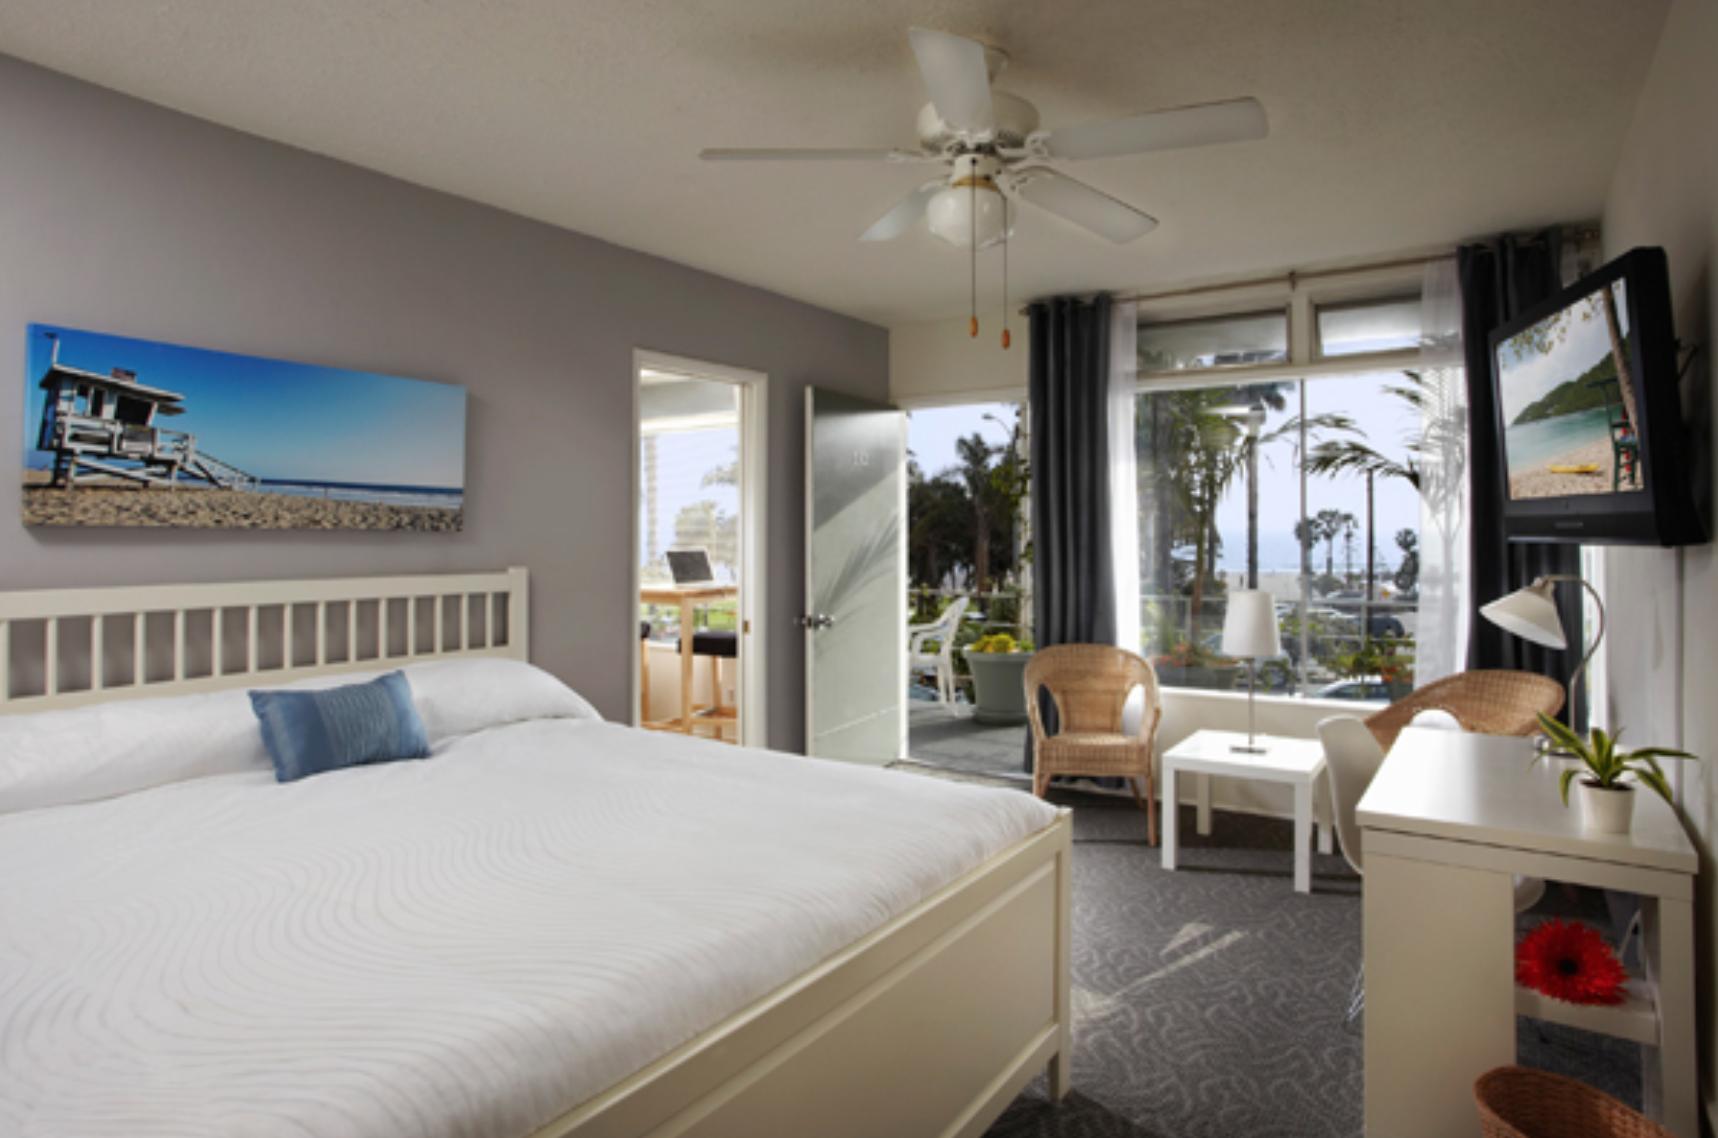 Santa Monica Bayside Hotel Los Angeles tips